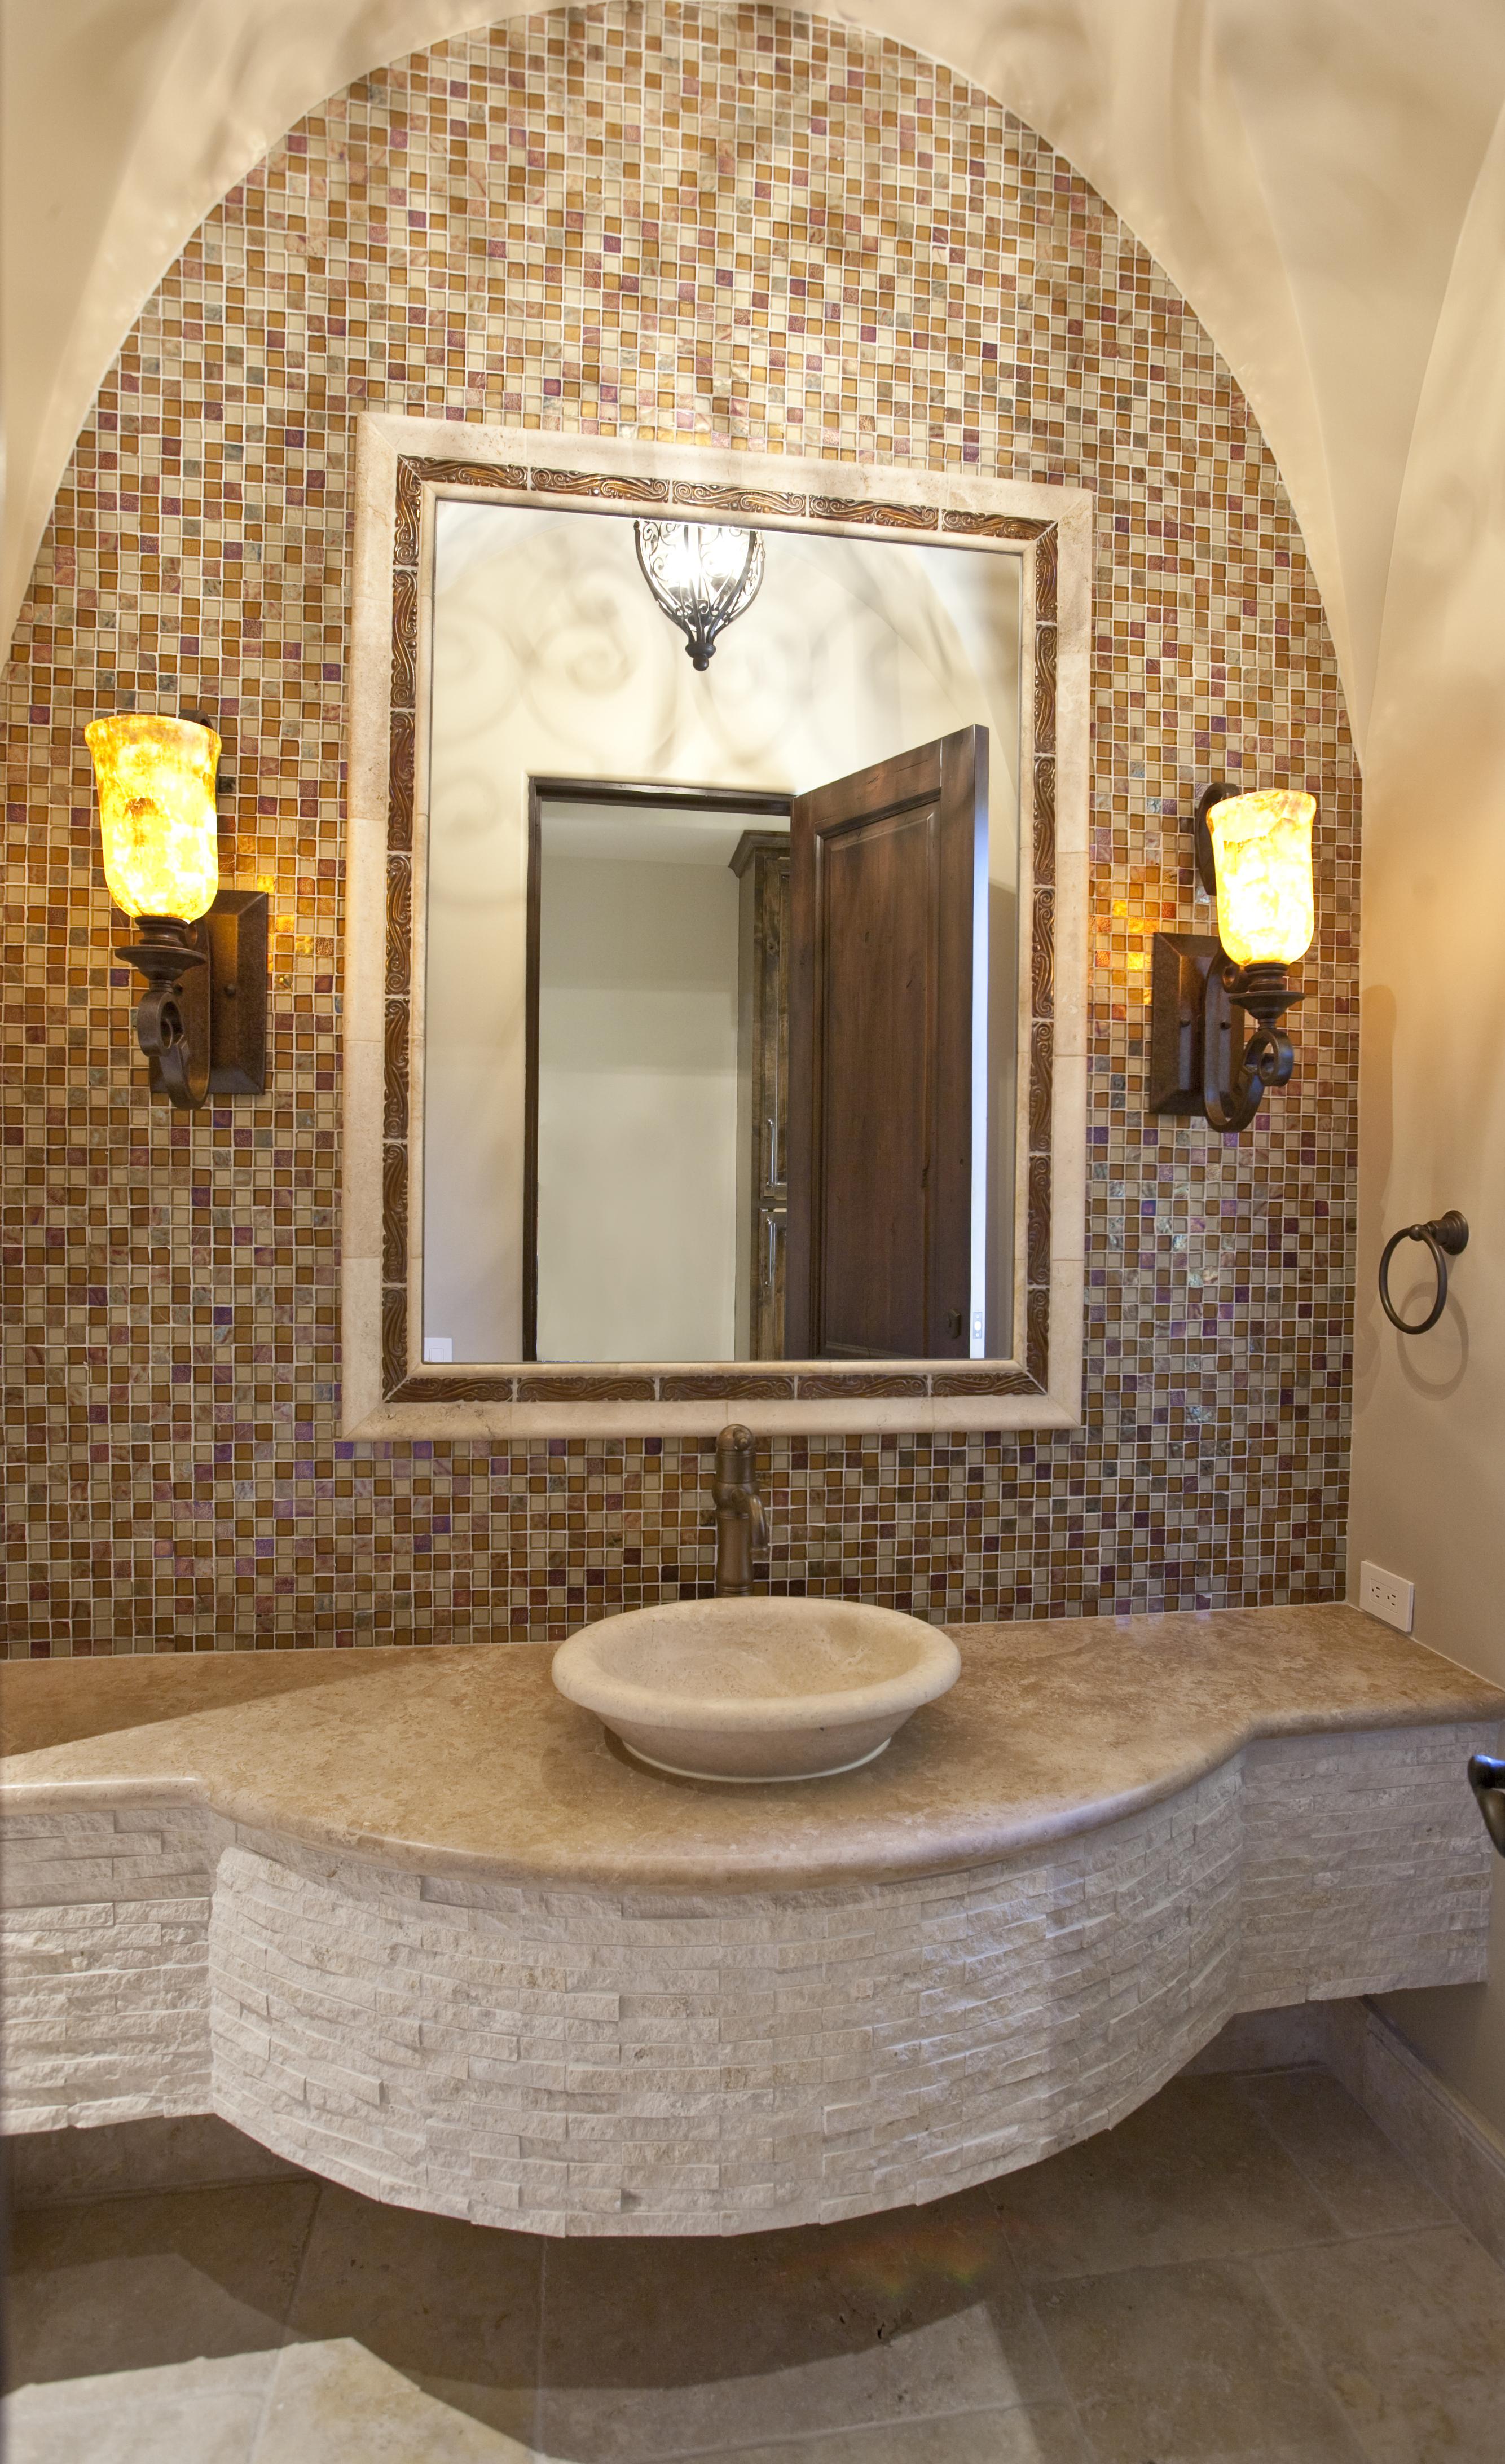 Pool bathroom ideas pin by sims on bathrooms best for Pool bathroom ideas